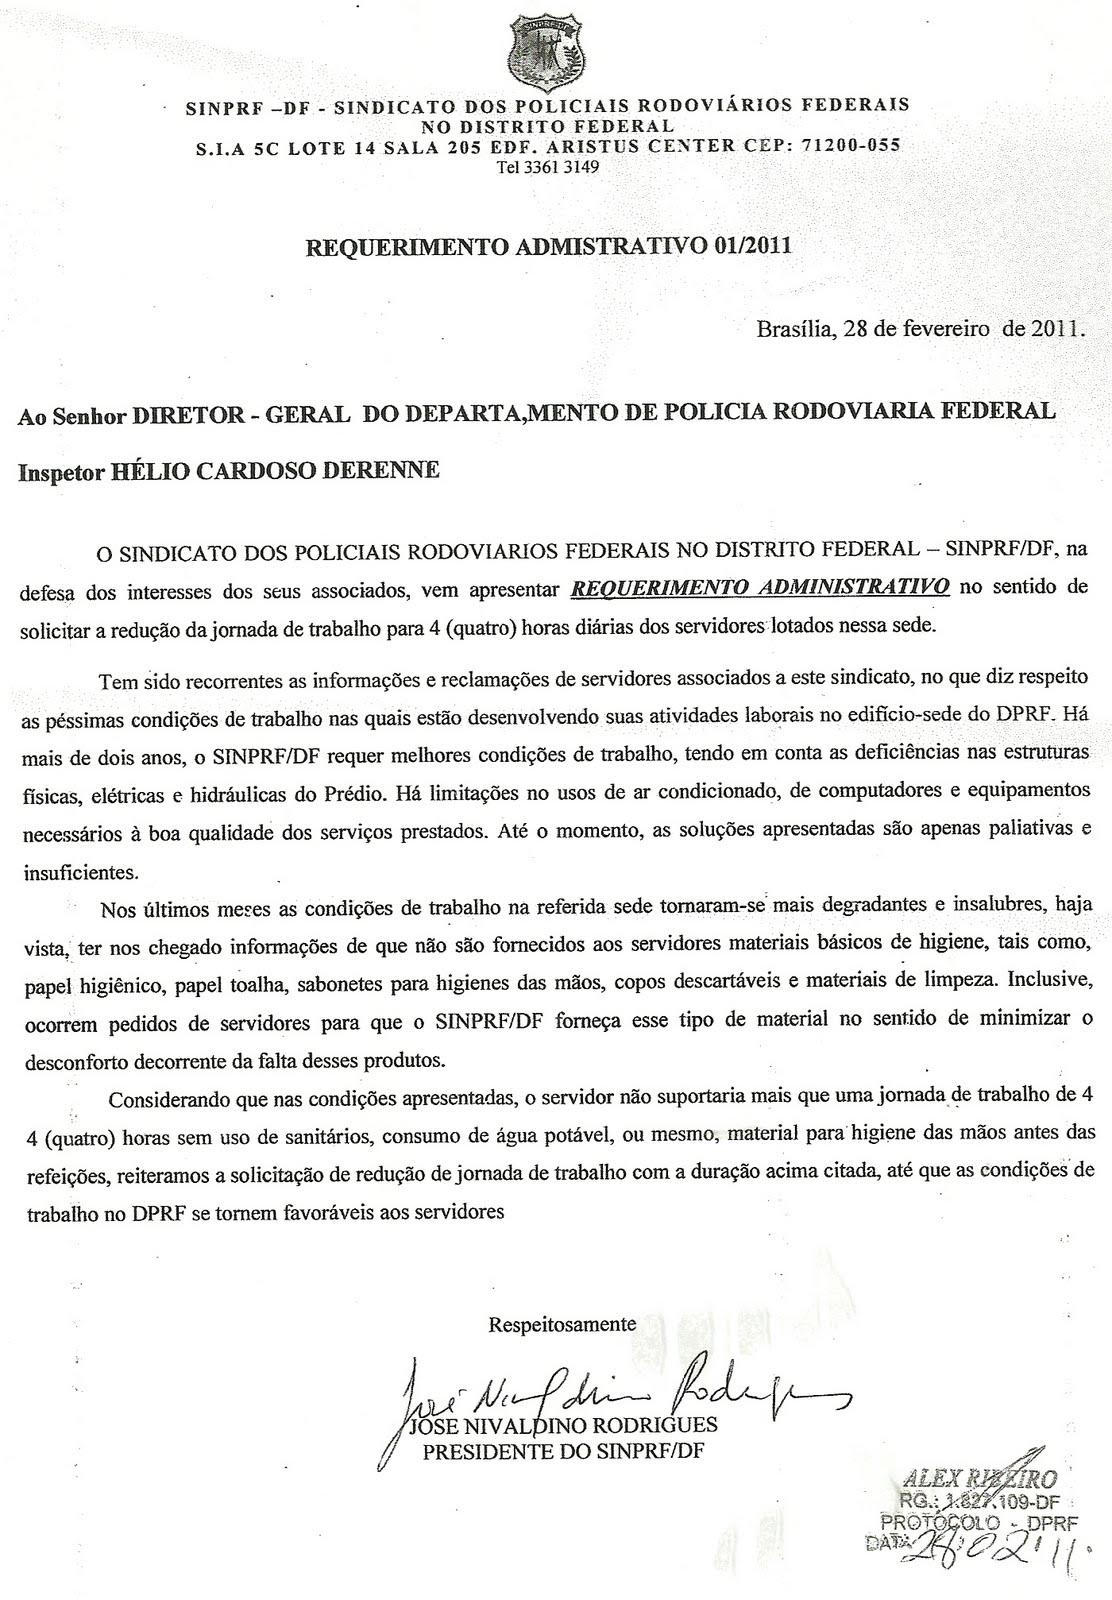 UNIDOS SOMOS INVENCÍVEIS: Março 2011 #555651 1112 1600